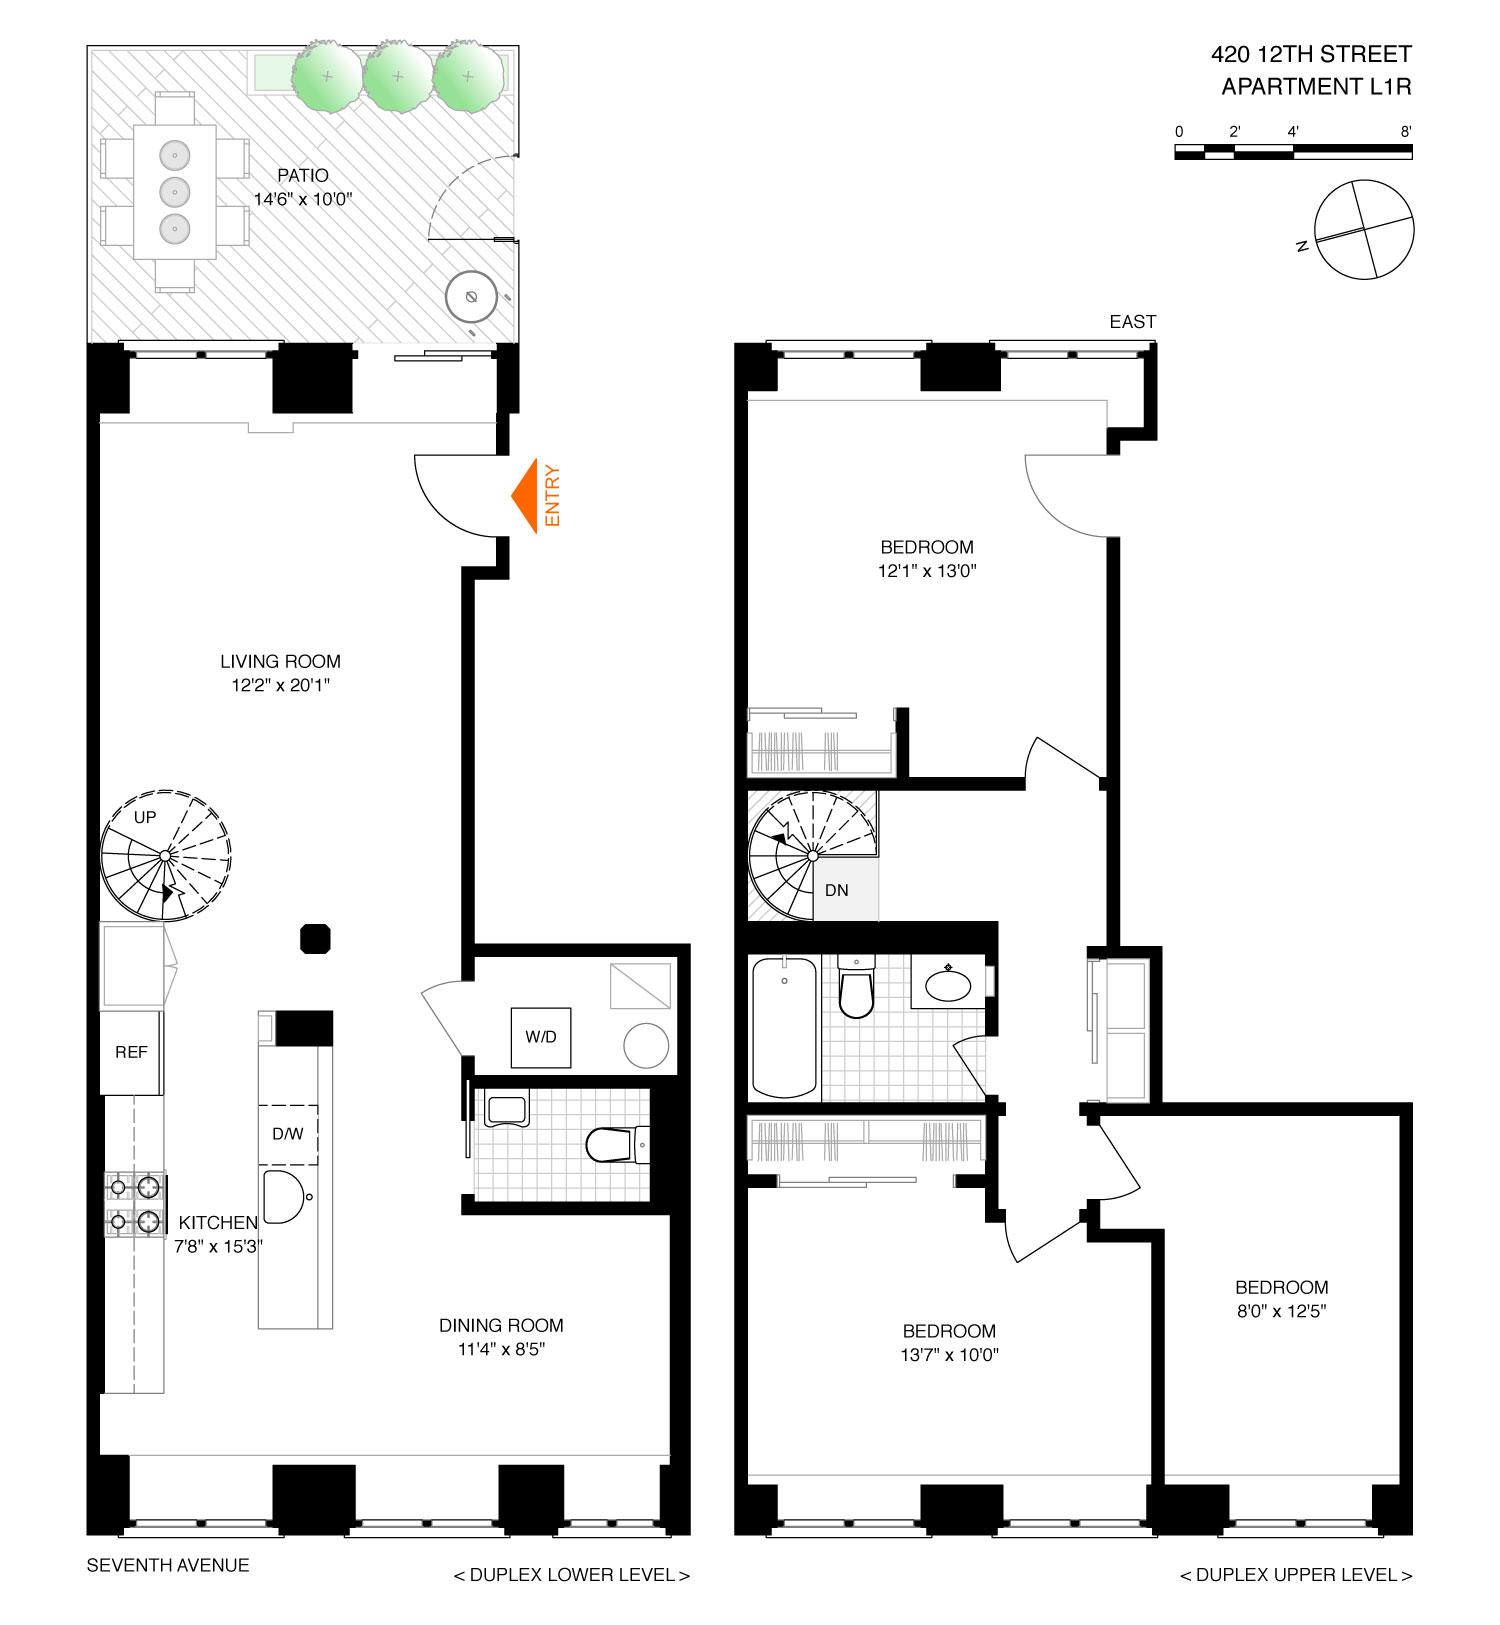 Corcoran, 420 12th Street, Apt  L1R, Park Slope Real Estate